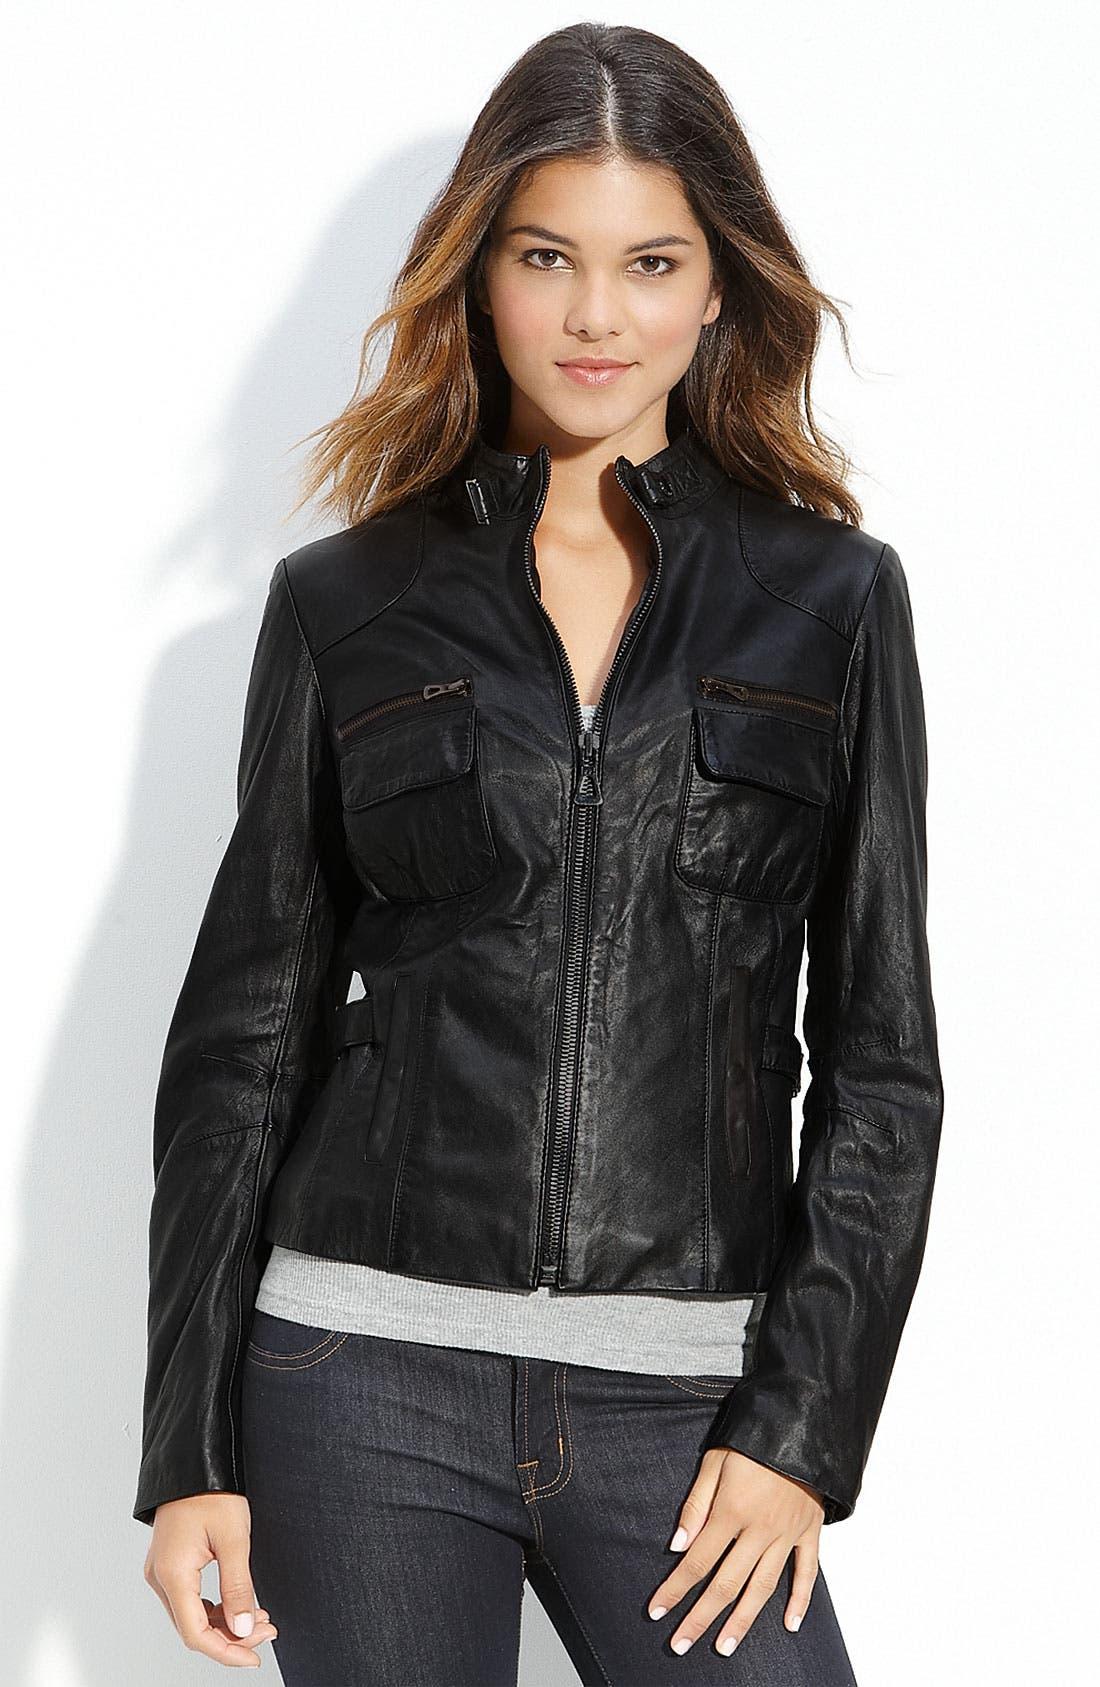 Main Image - Bod & Christensen Stand Collar Leather Jacket